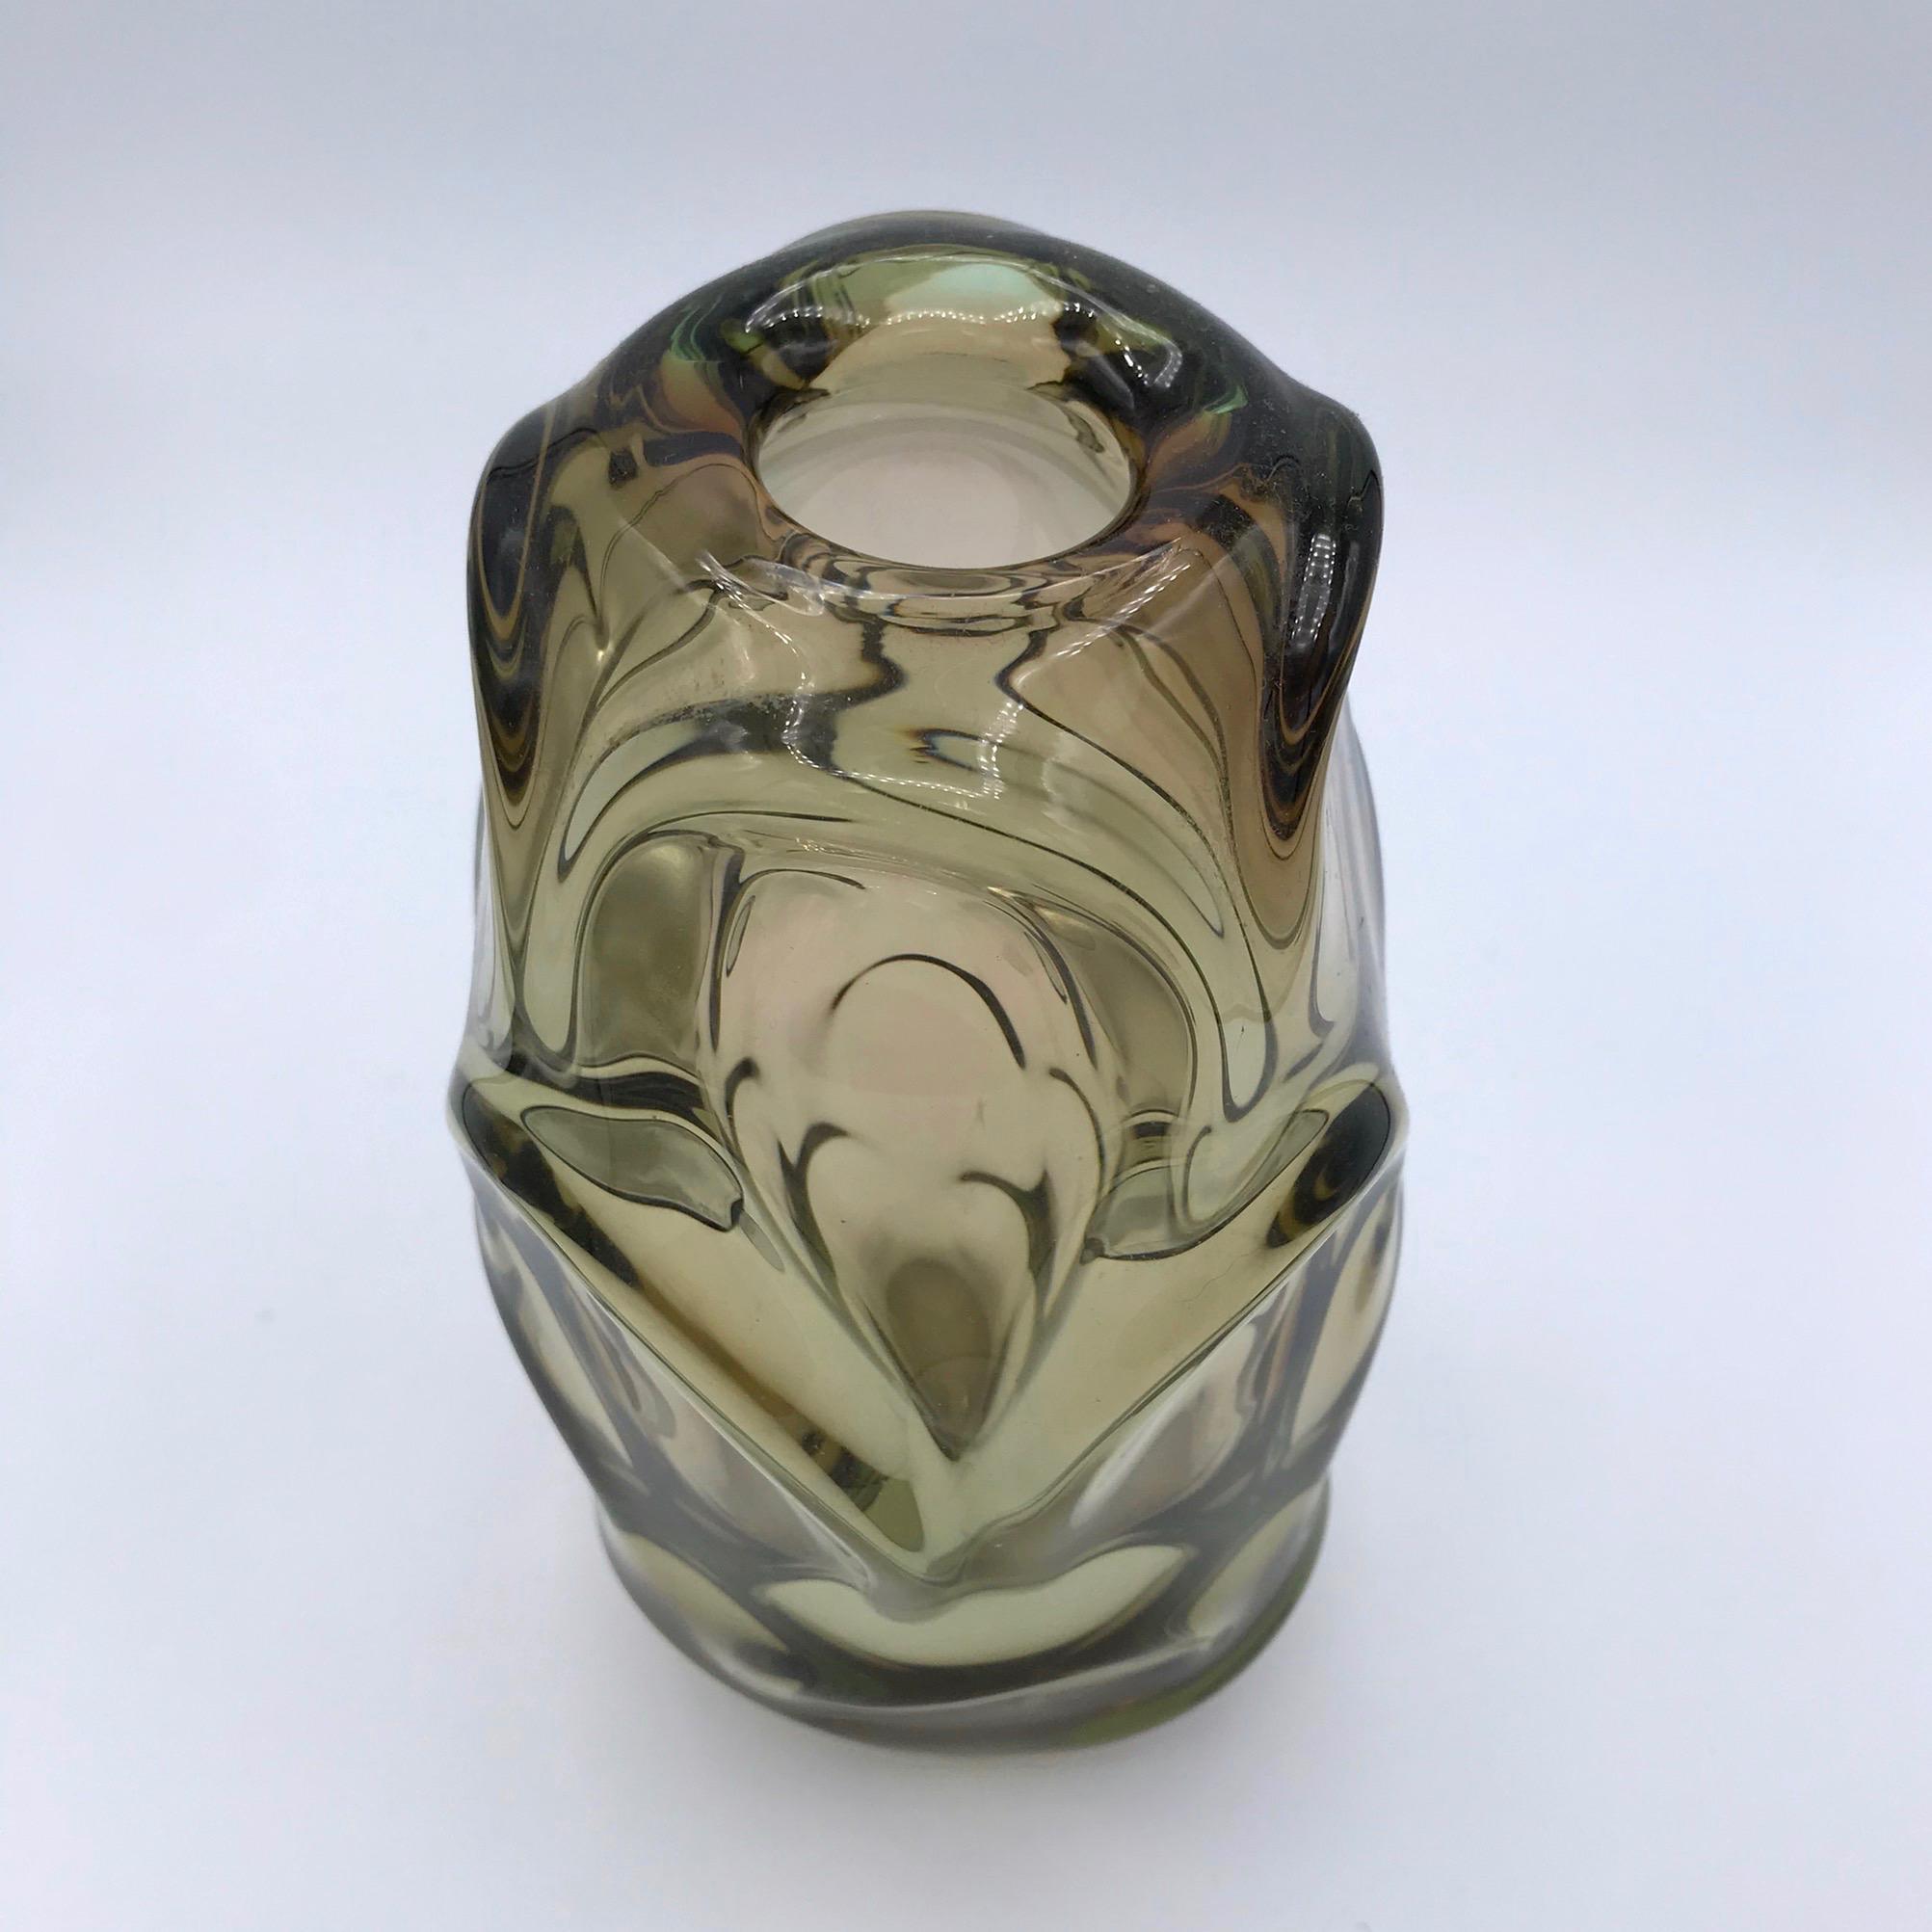 1970s Smoky Glass Vase